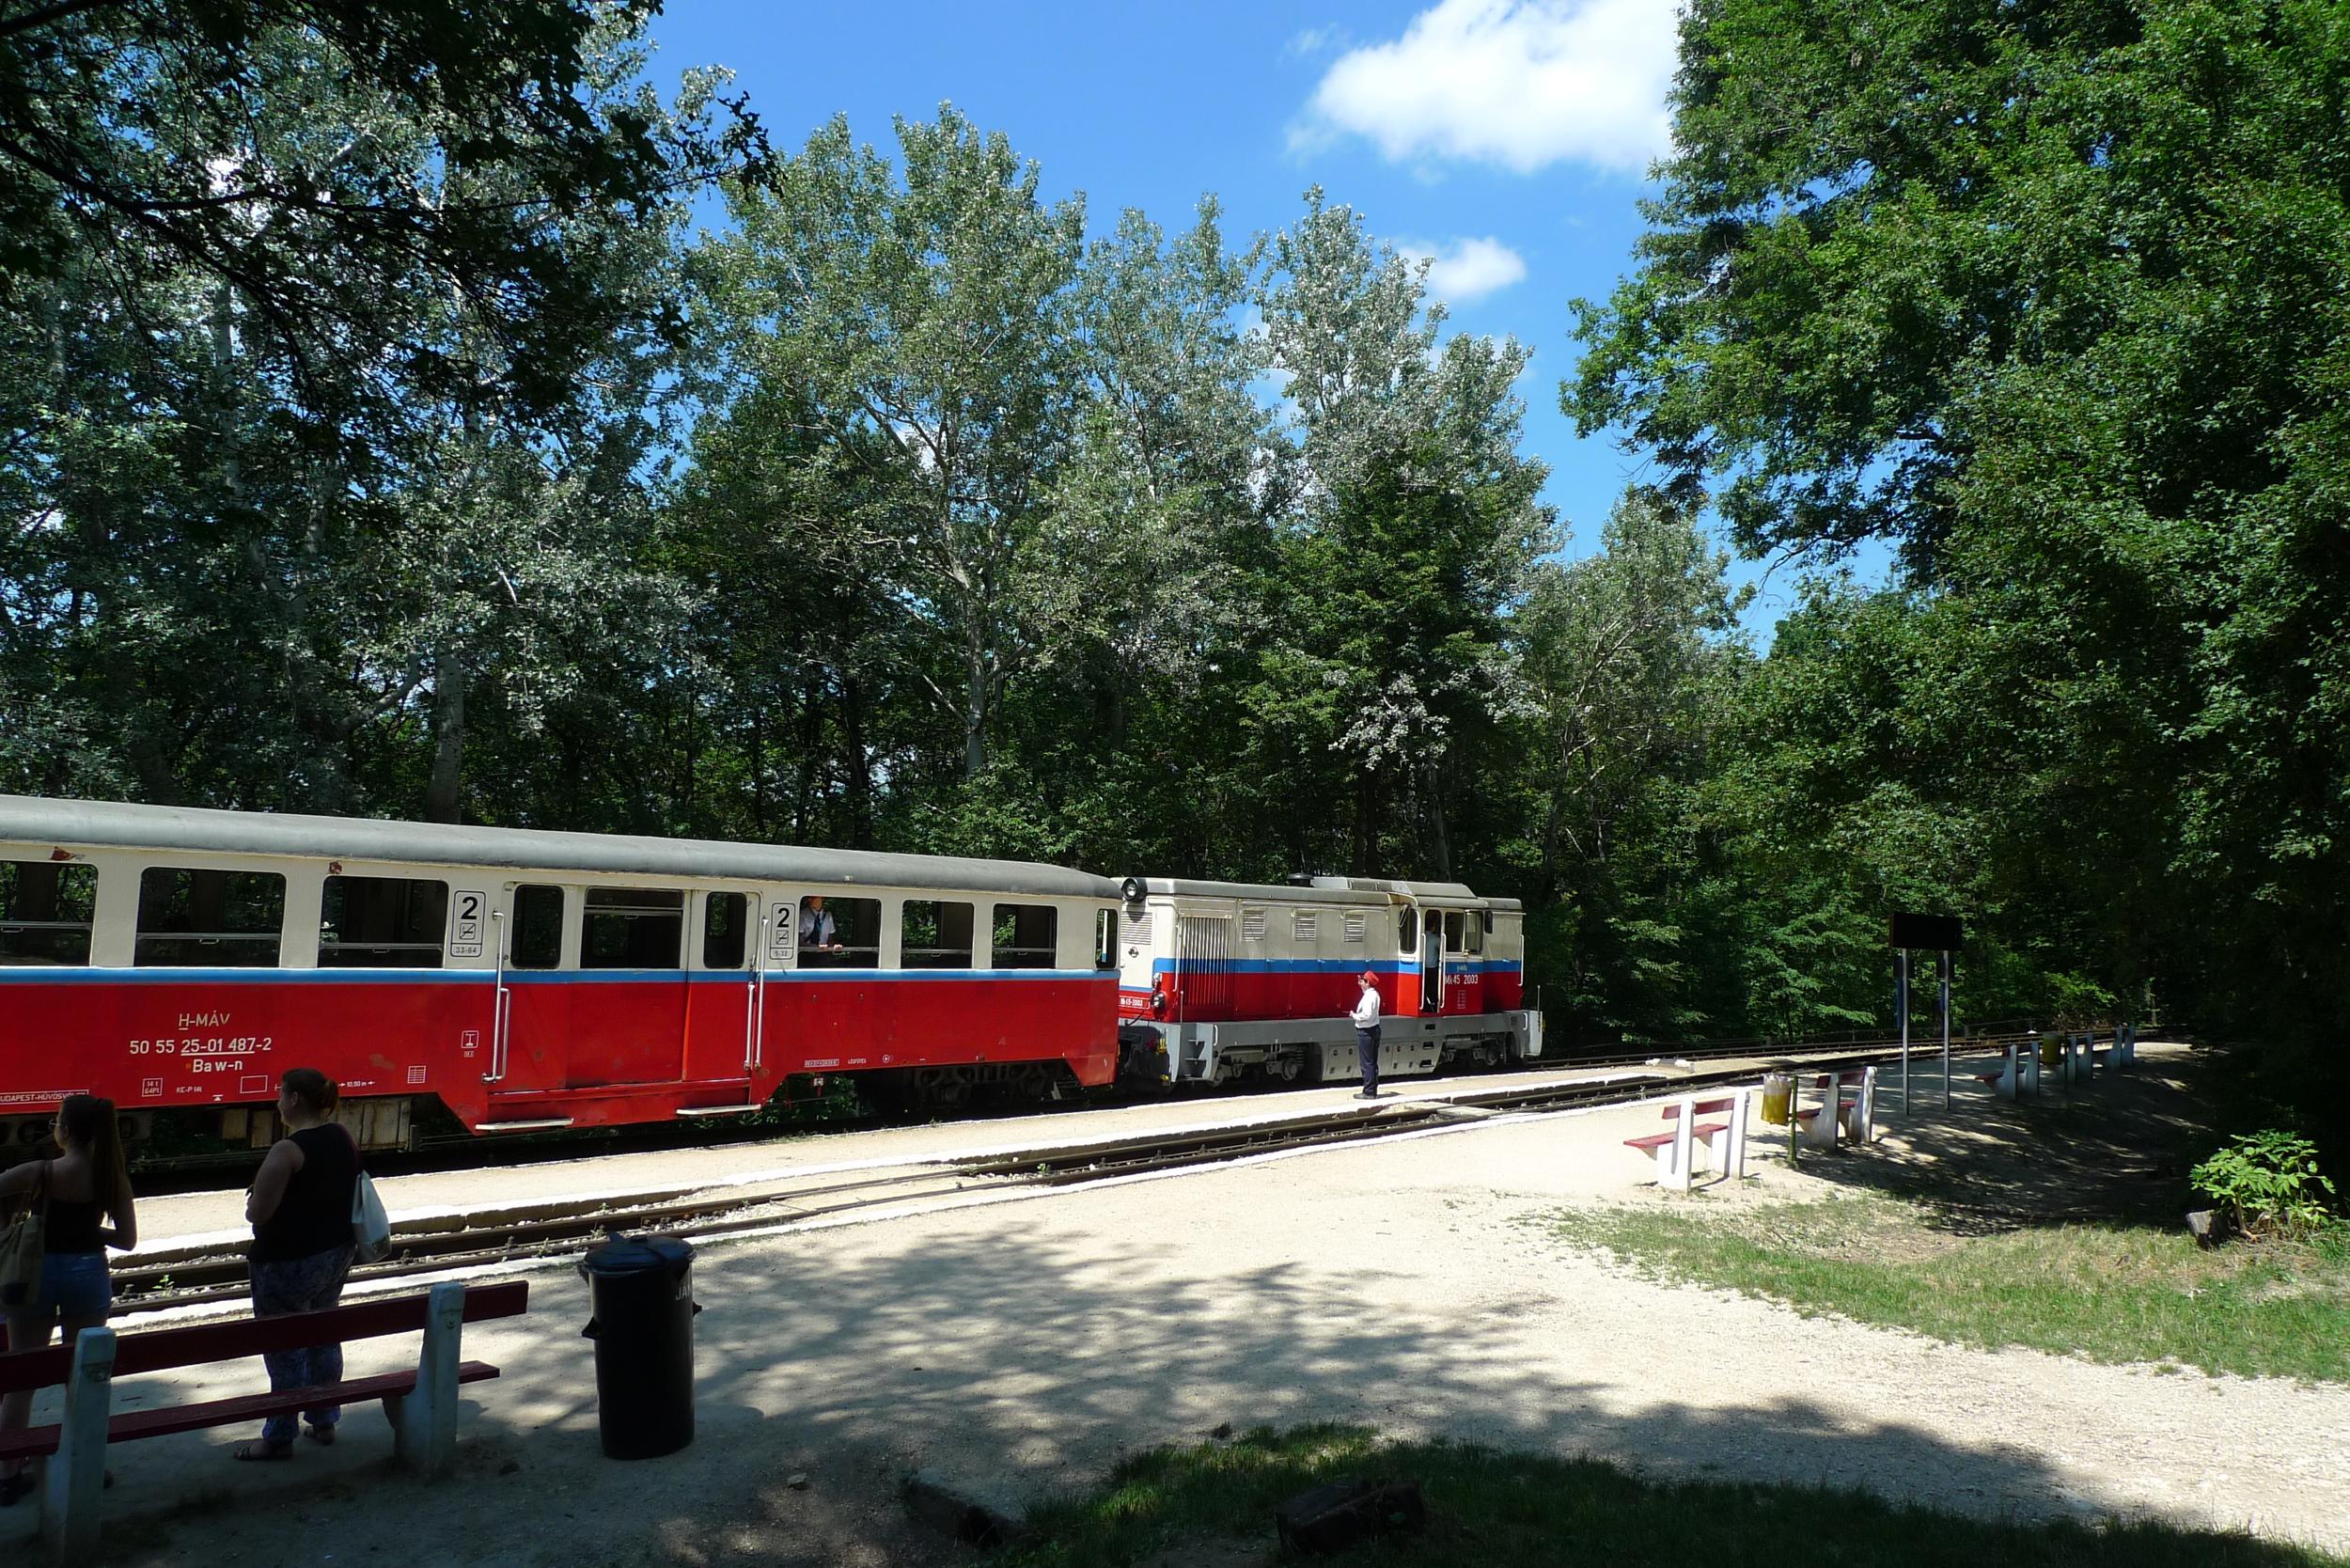 Children's Railway gyermekvasut budapest buda hills hungary